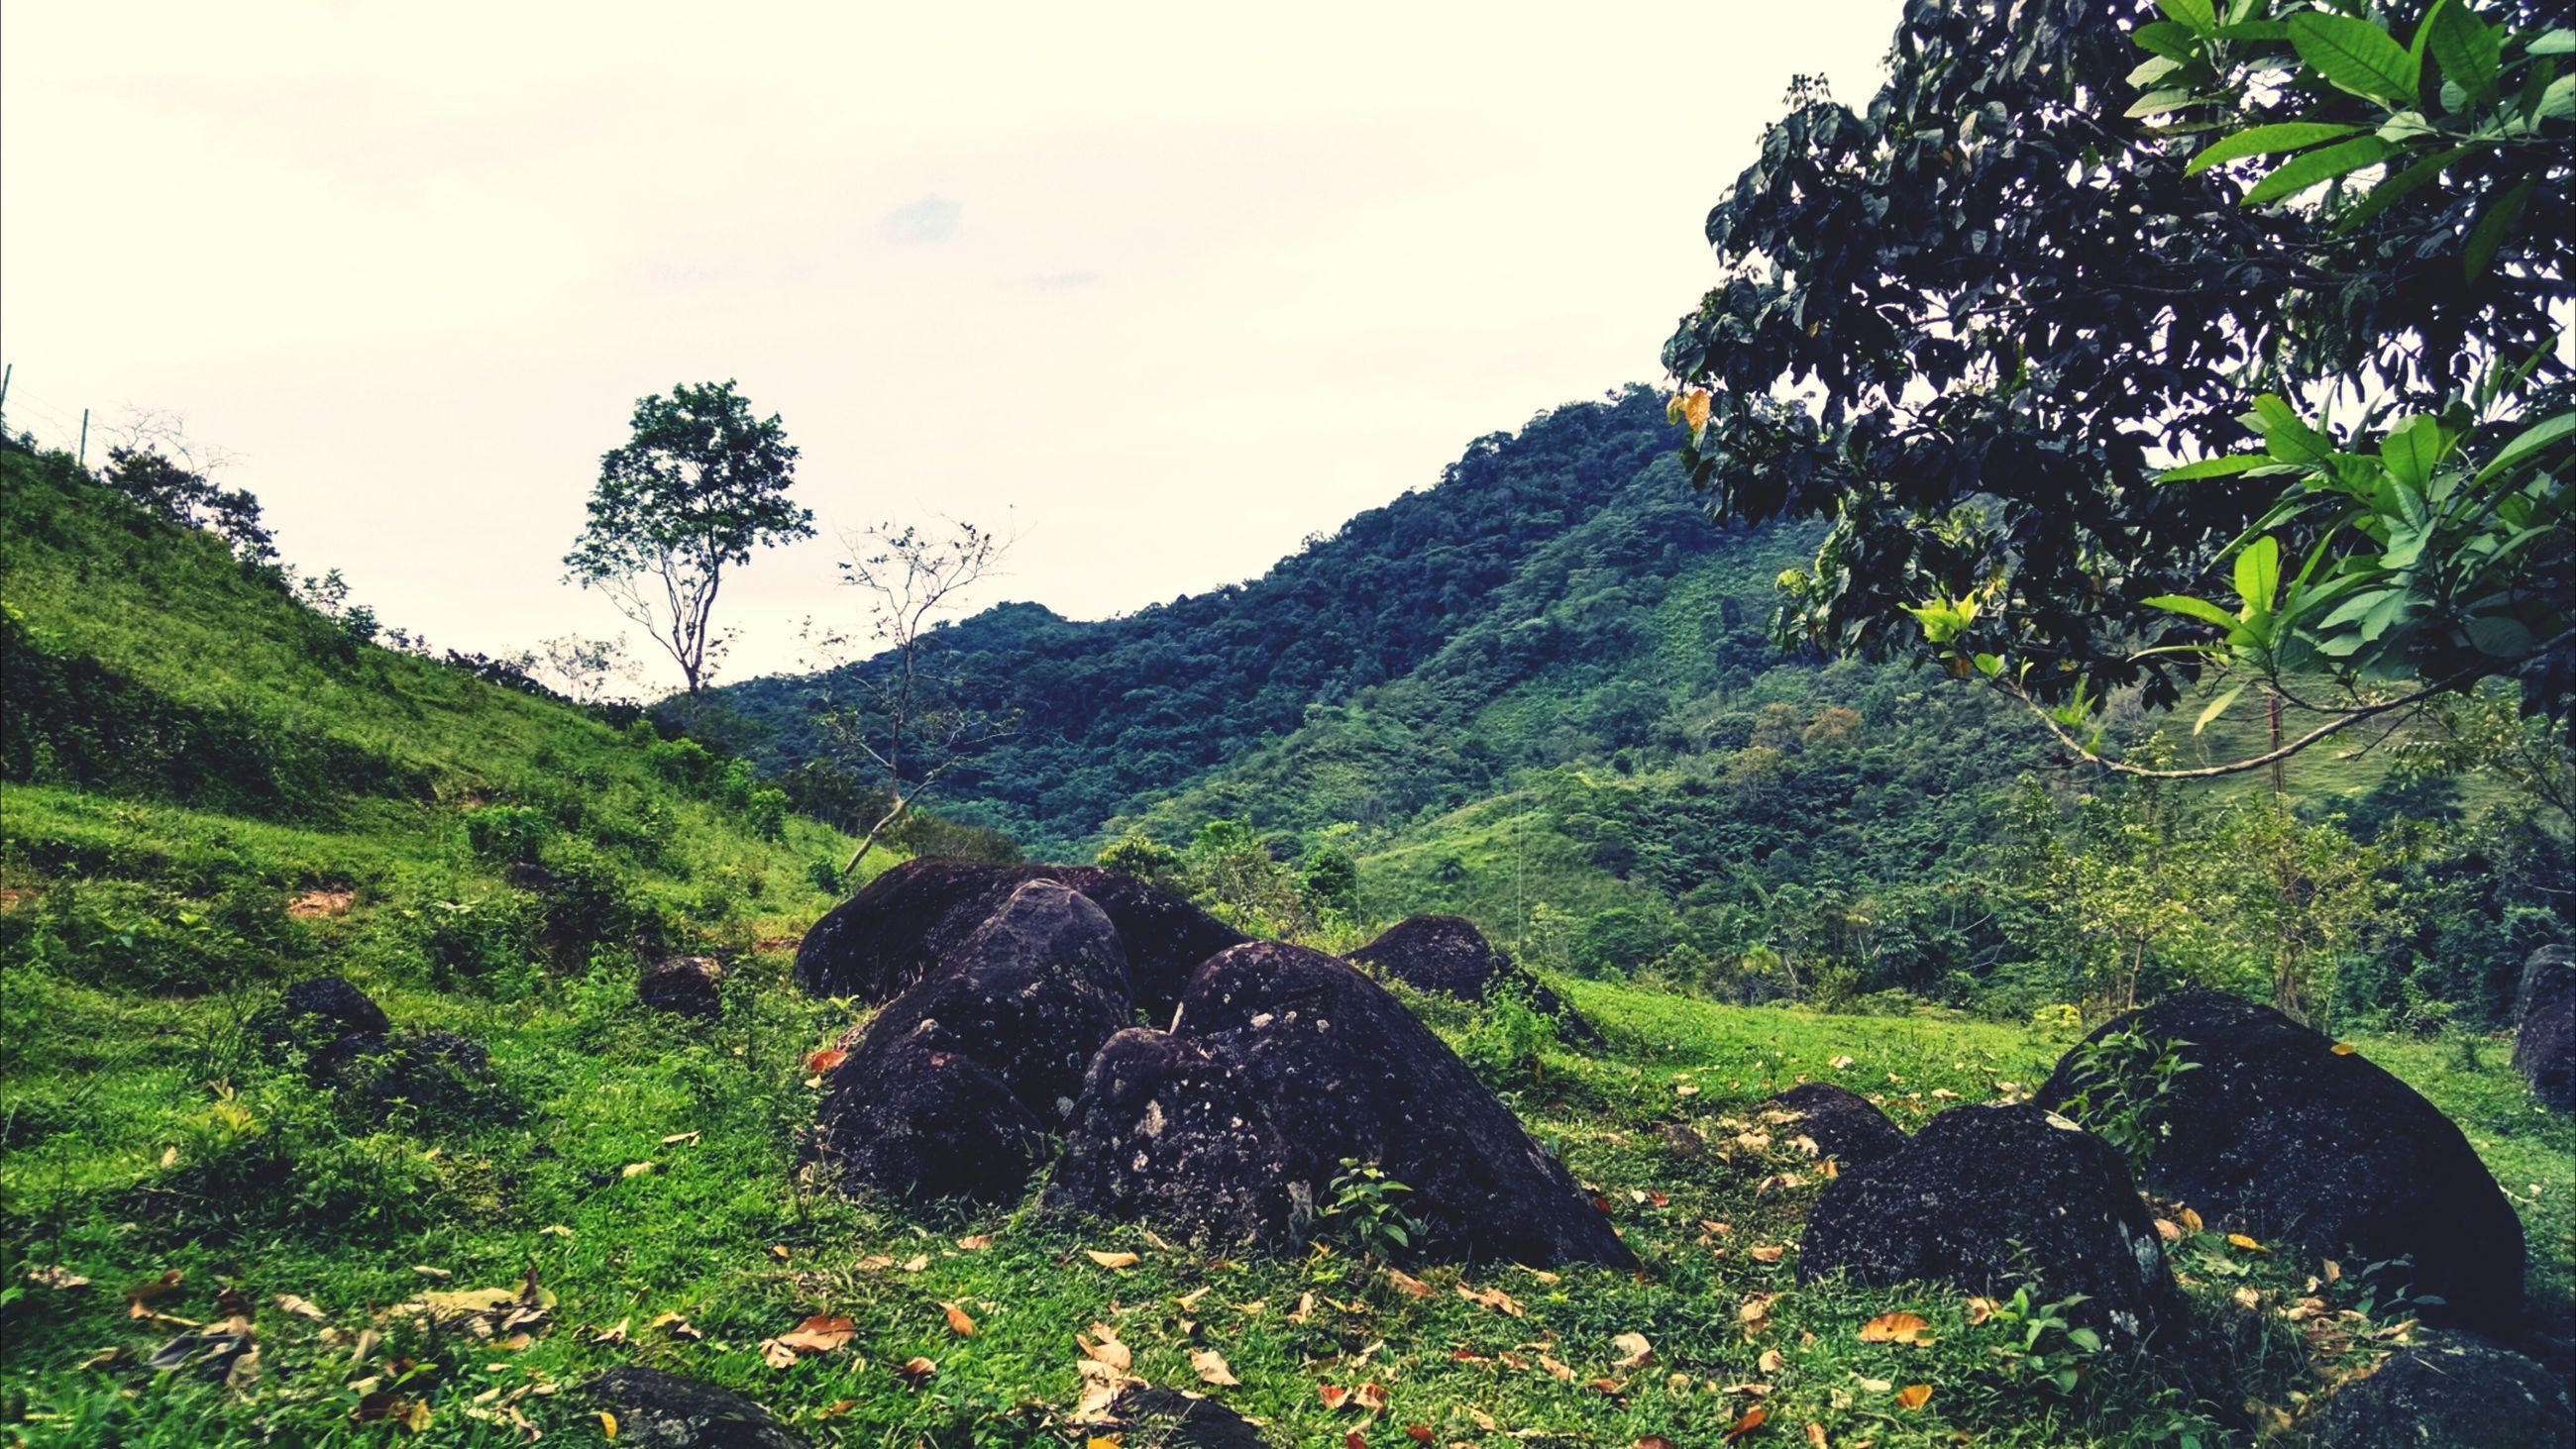 mountain, tranquility, tree, tranquil scene, scenics, green color, beauty in nature, landscape, nature, growth, sky, non-urban scene, grass, lush foliage, mountain range, plant, idyllic, remote, hill, green